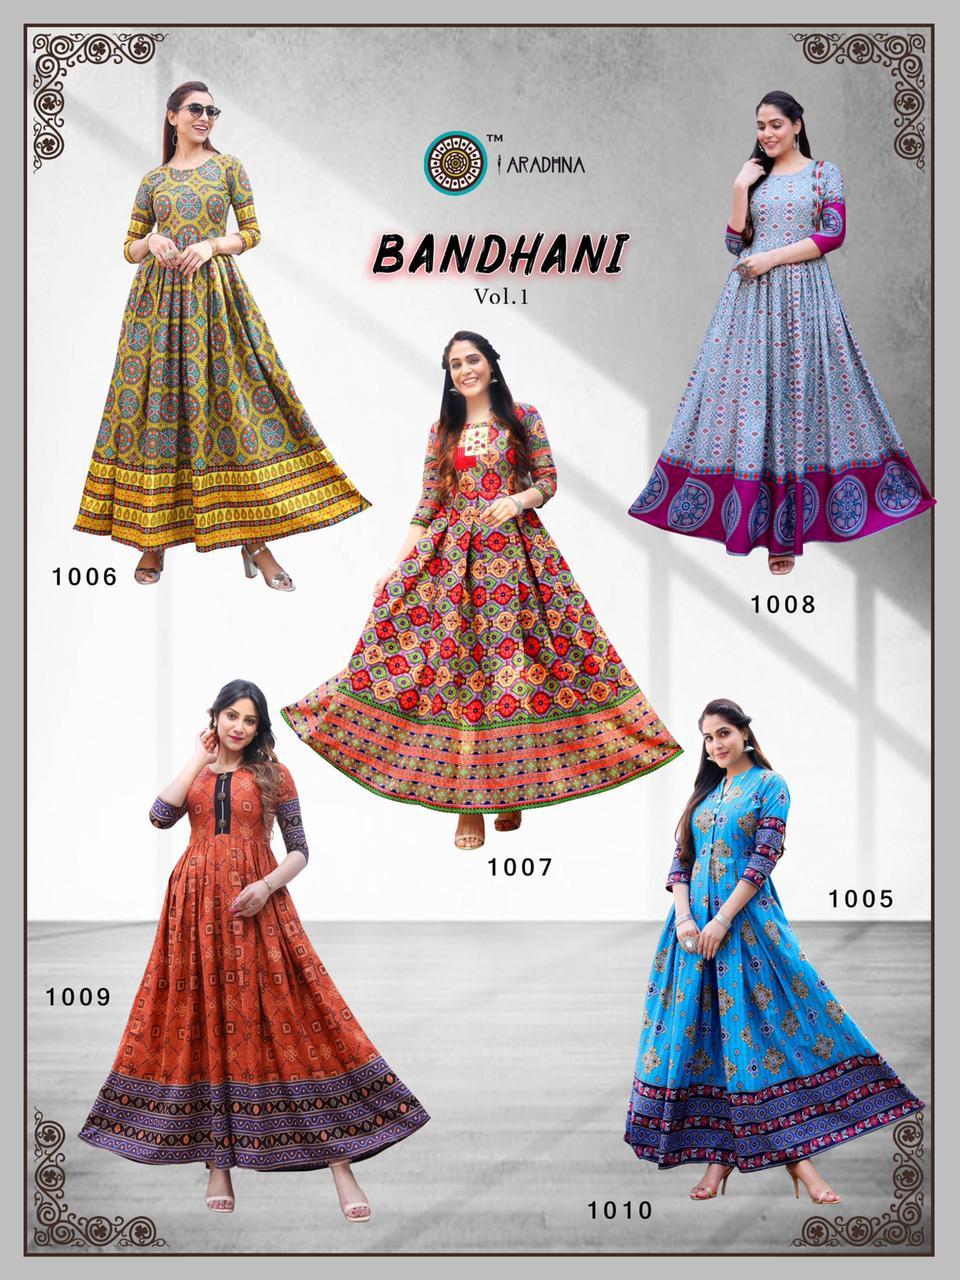 Aradhna Bandhani Vol 1 Kurti Wholesale Catalog 10 Pcs 19 - Aradhna Bandhani Vol 1 Kurti Wholesale Catalog 10 Pcs